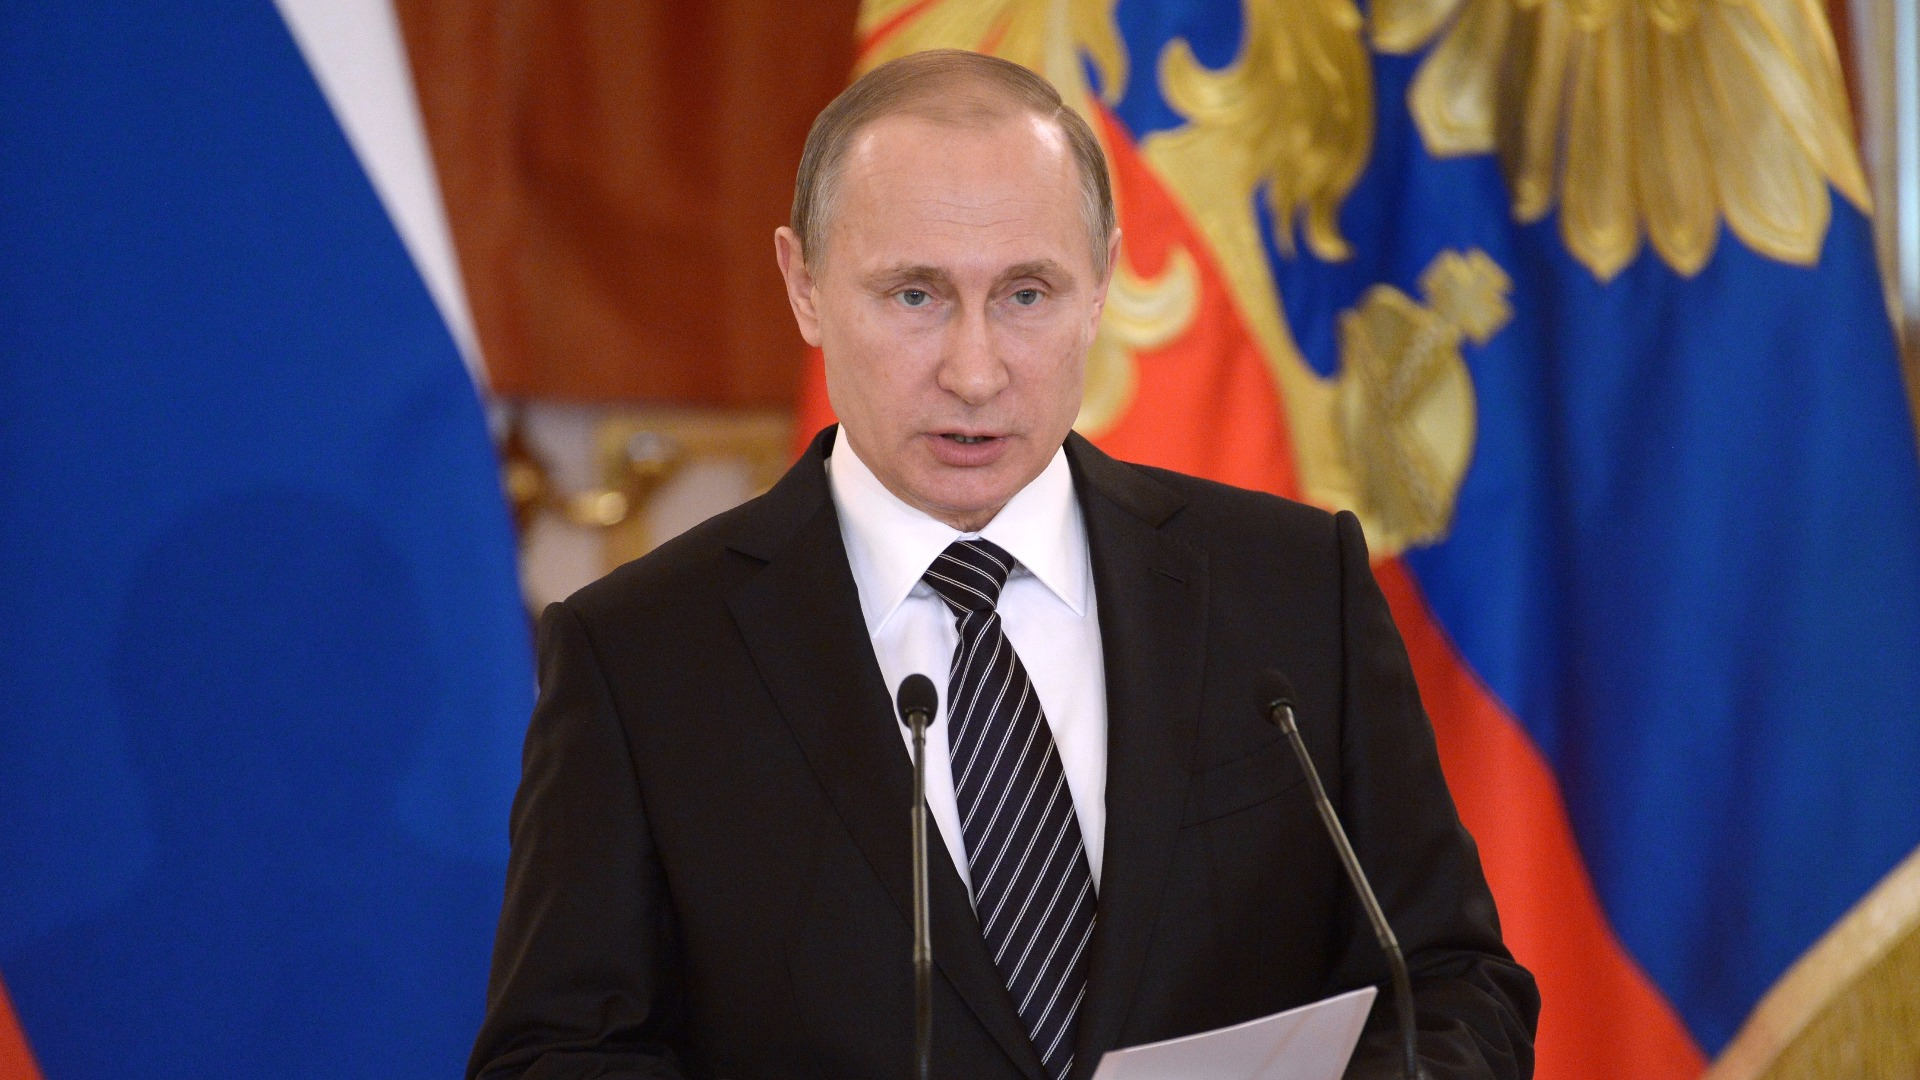 Владимир Путин: Унищожили сме 800 бандити и 66 терористични клетки